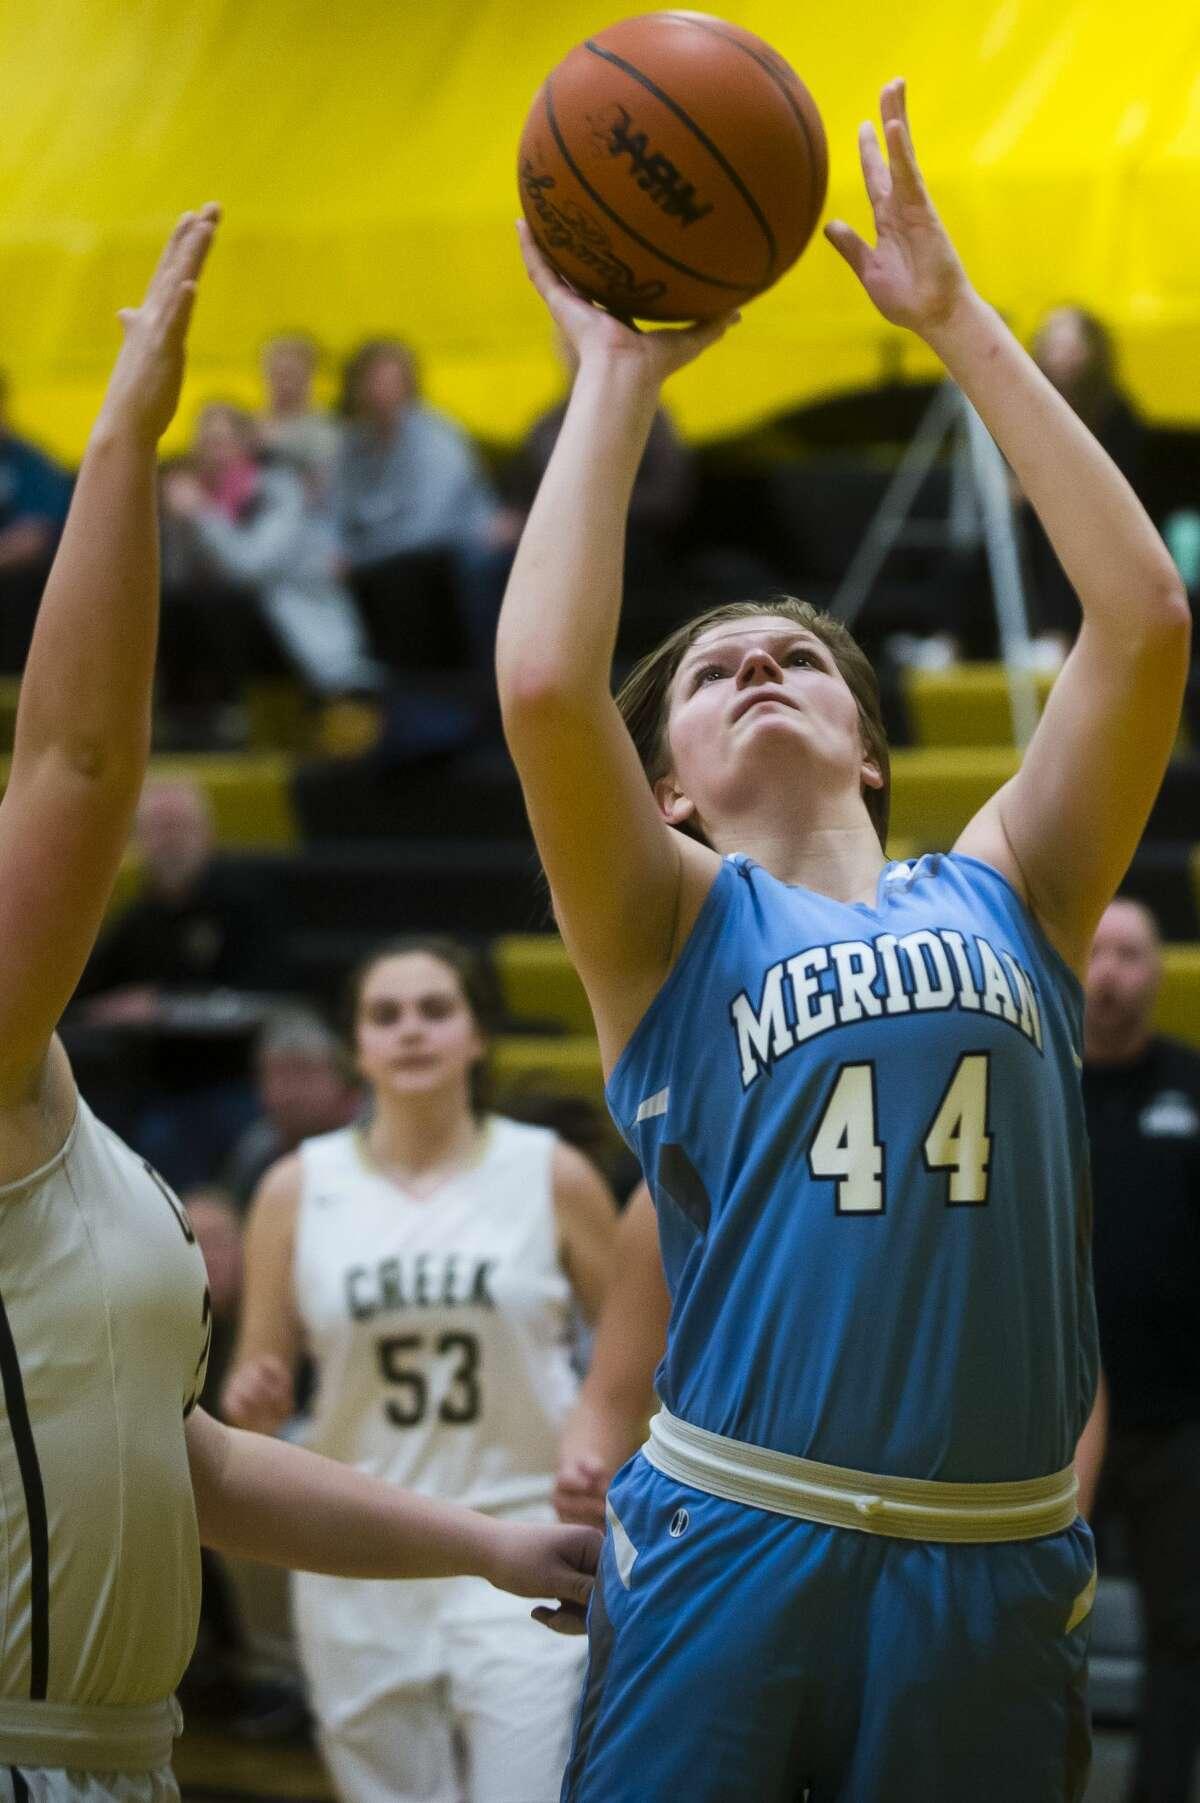 Meridian junior Baleigh Hill takes a shot during a game against Bullock Creek on Tuesday, Jan. 23, 2018 at Bullock Creek High School. Bullock Creek won 42-33. (Katy Kildee/kkildee@mdn.net)